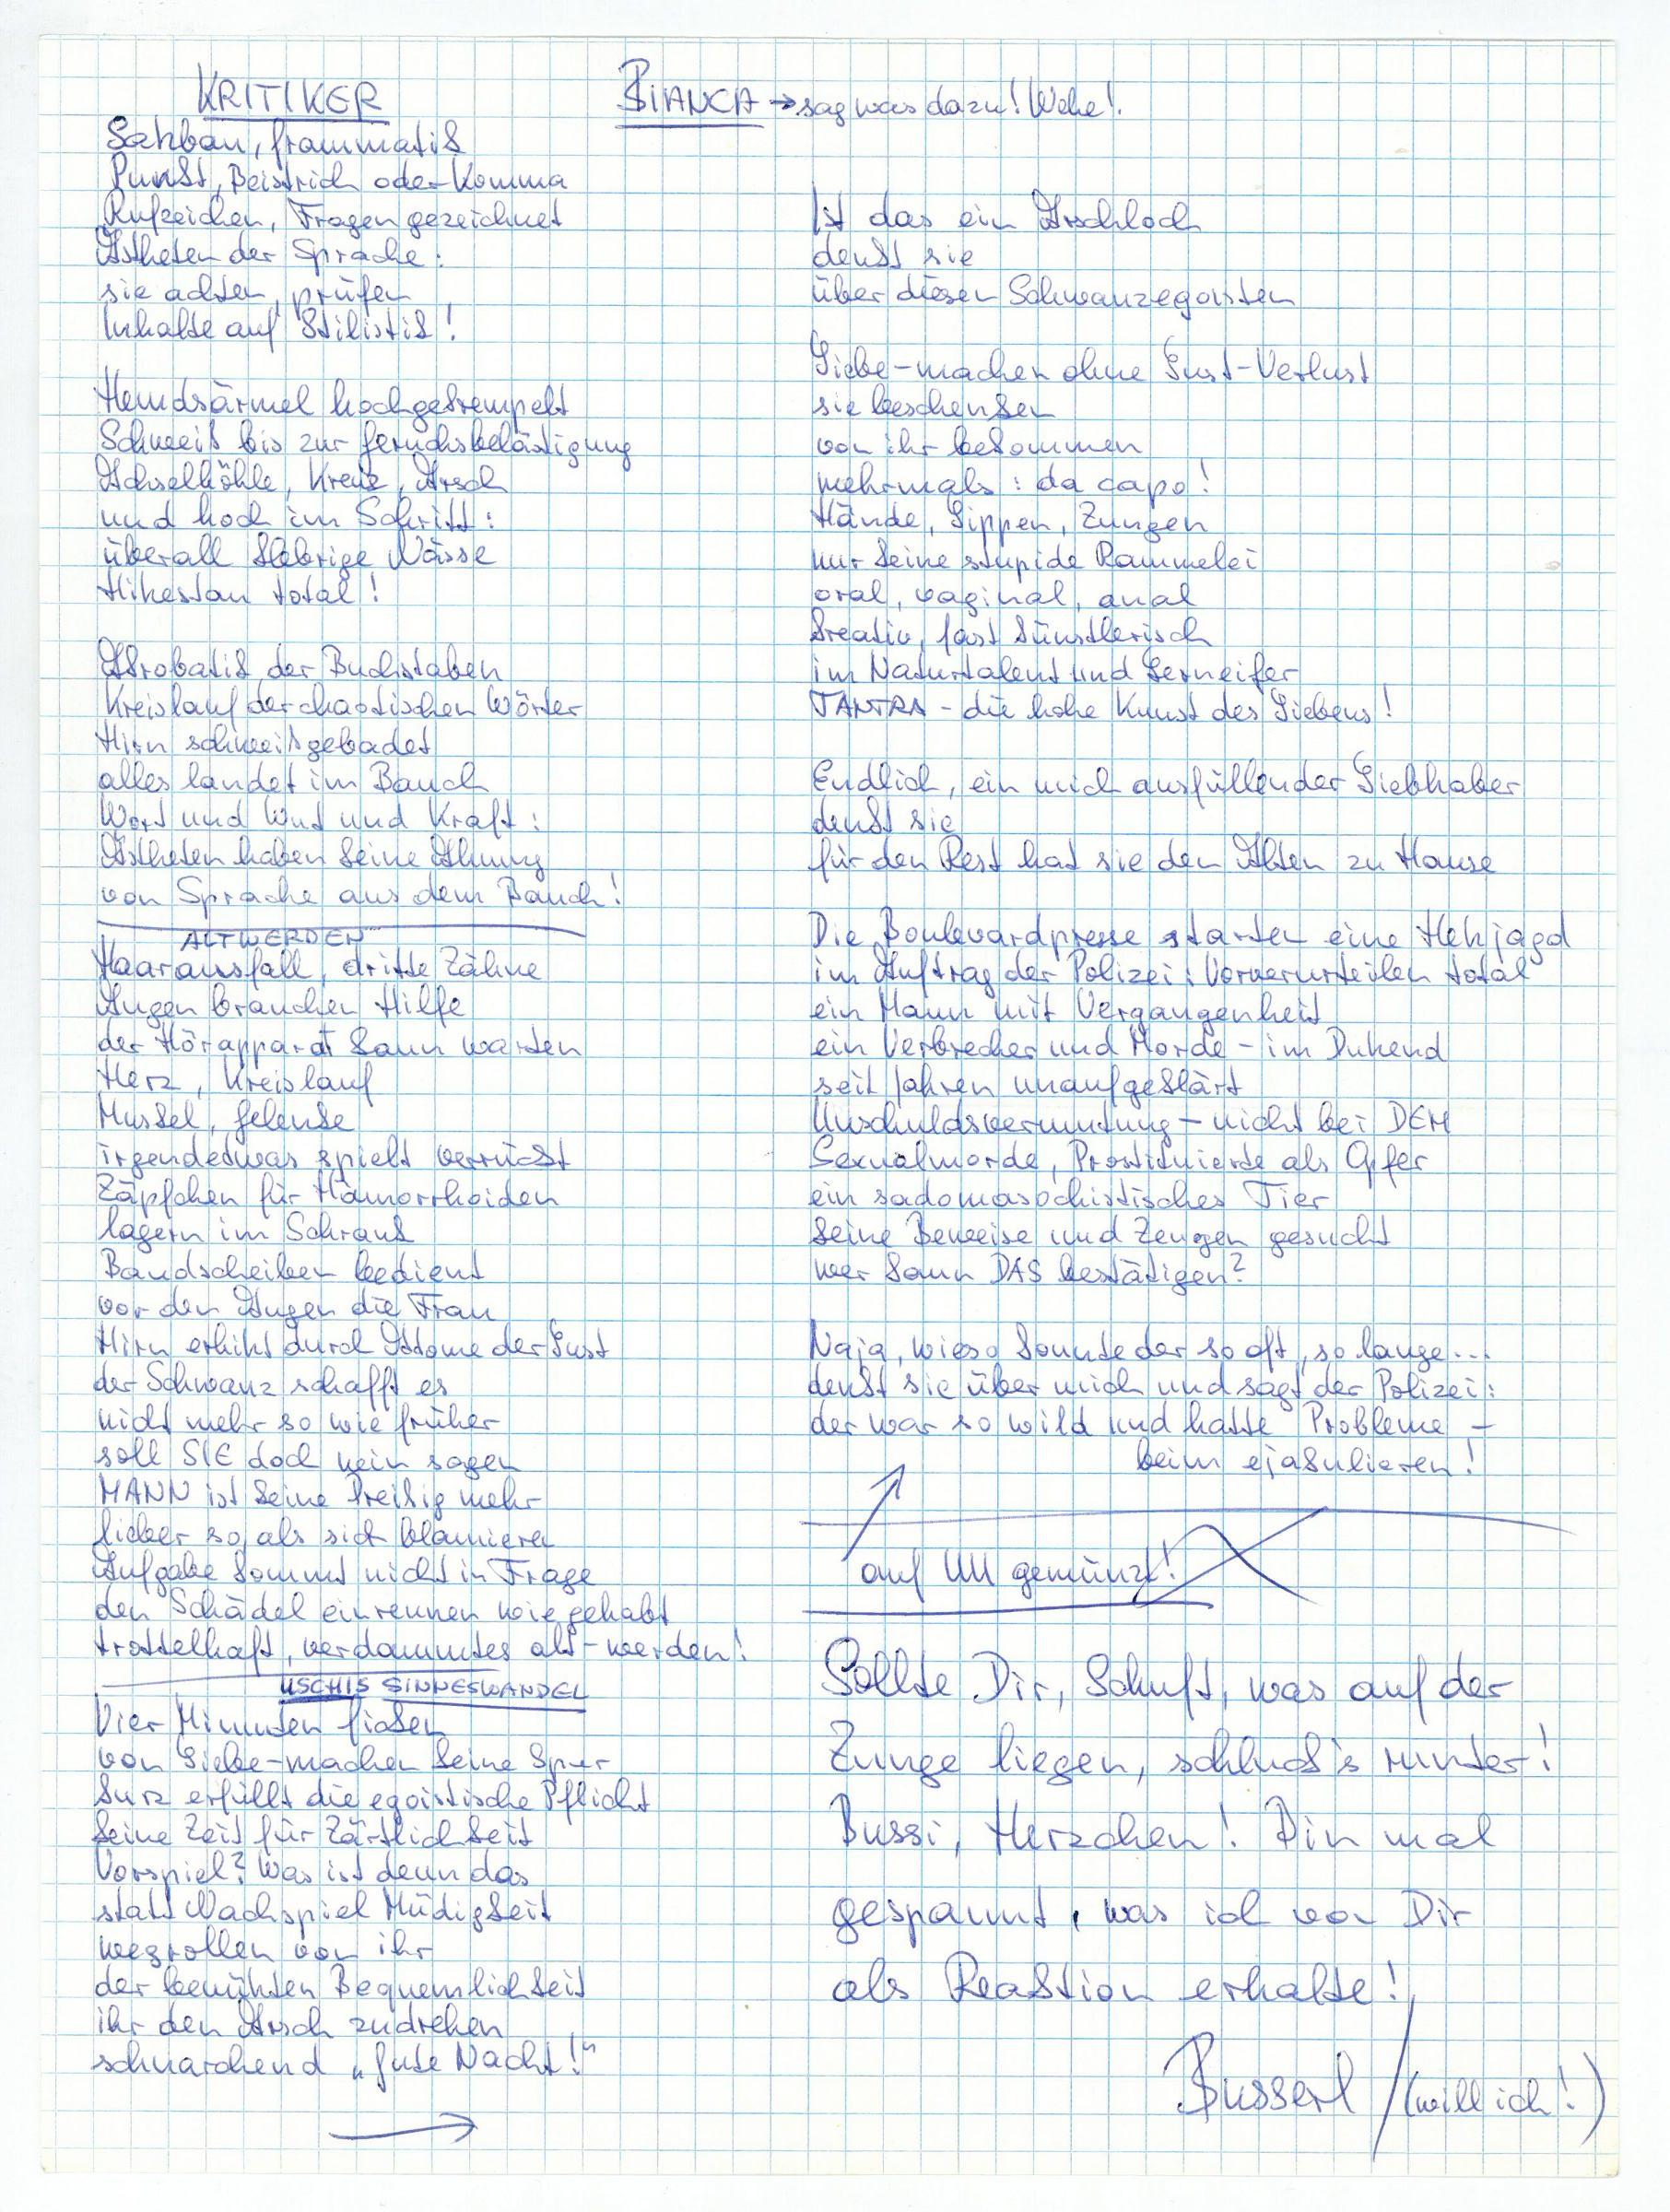 3 autogr. manuscripts.: Unterweger, Jack, Austrian